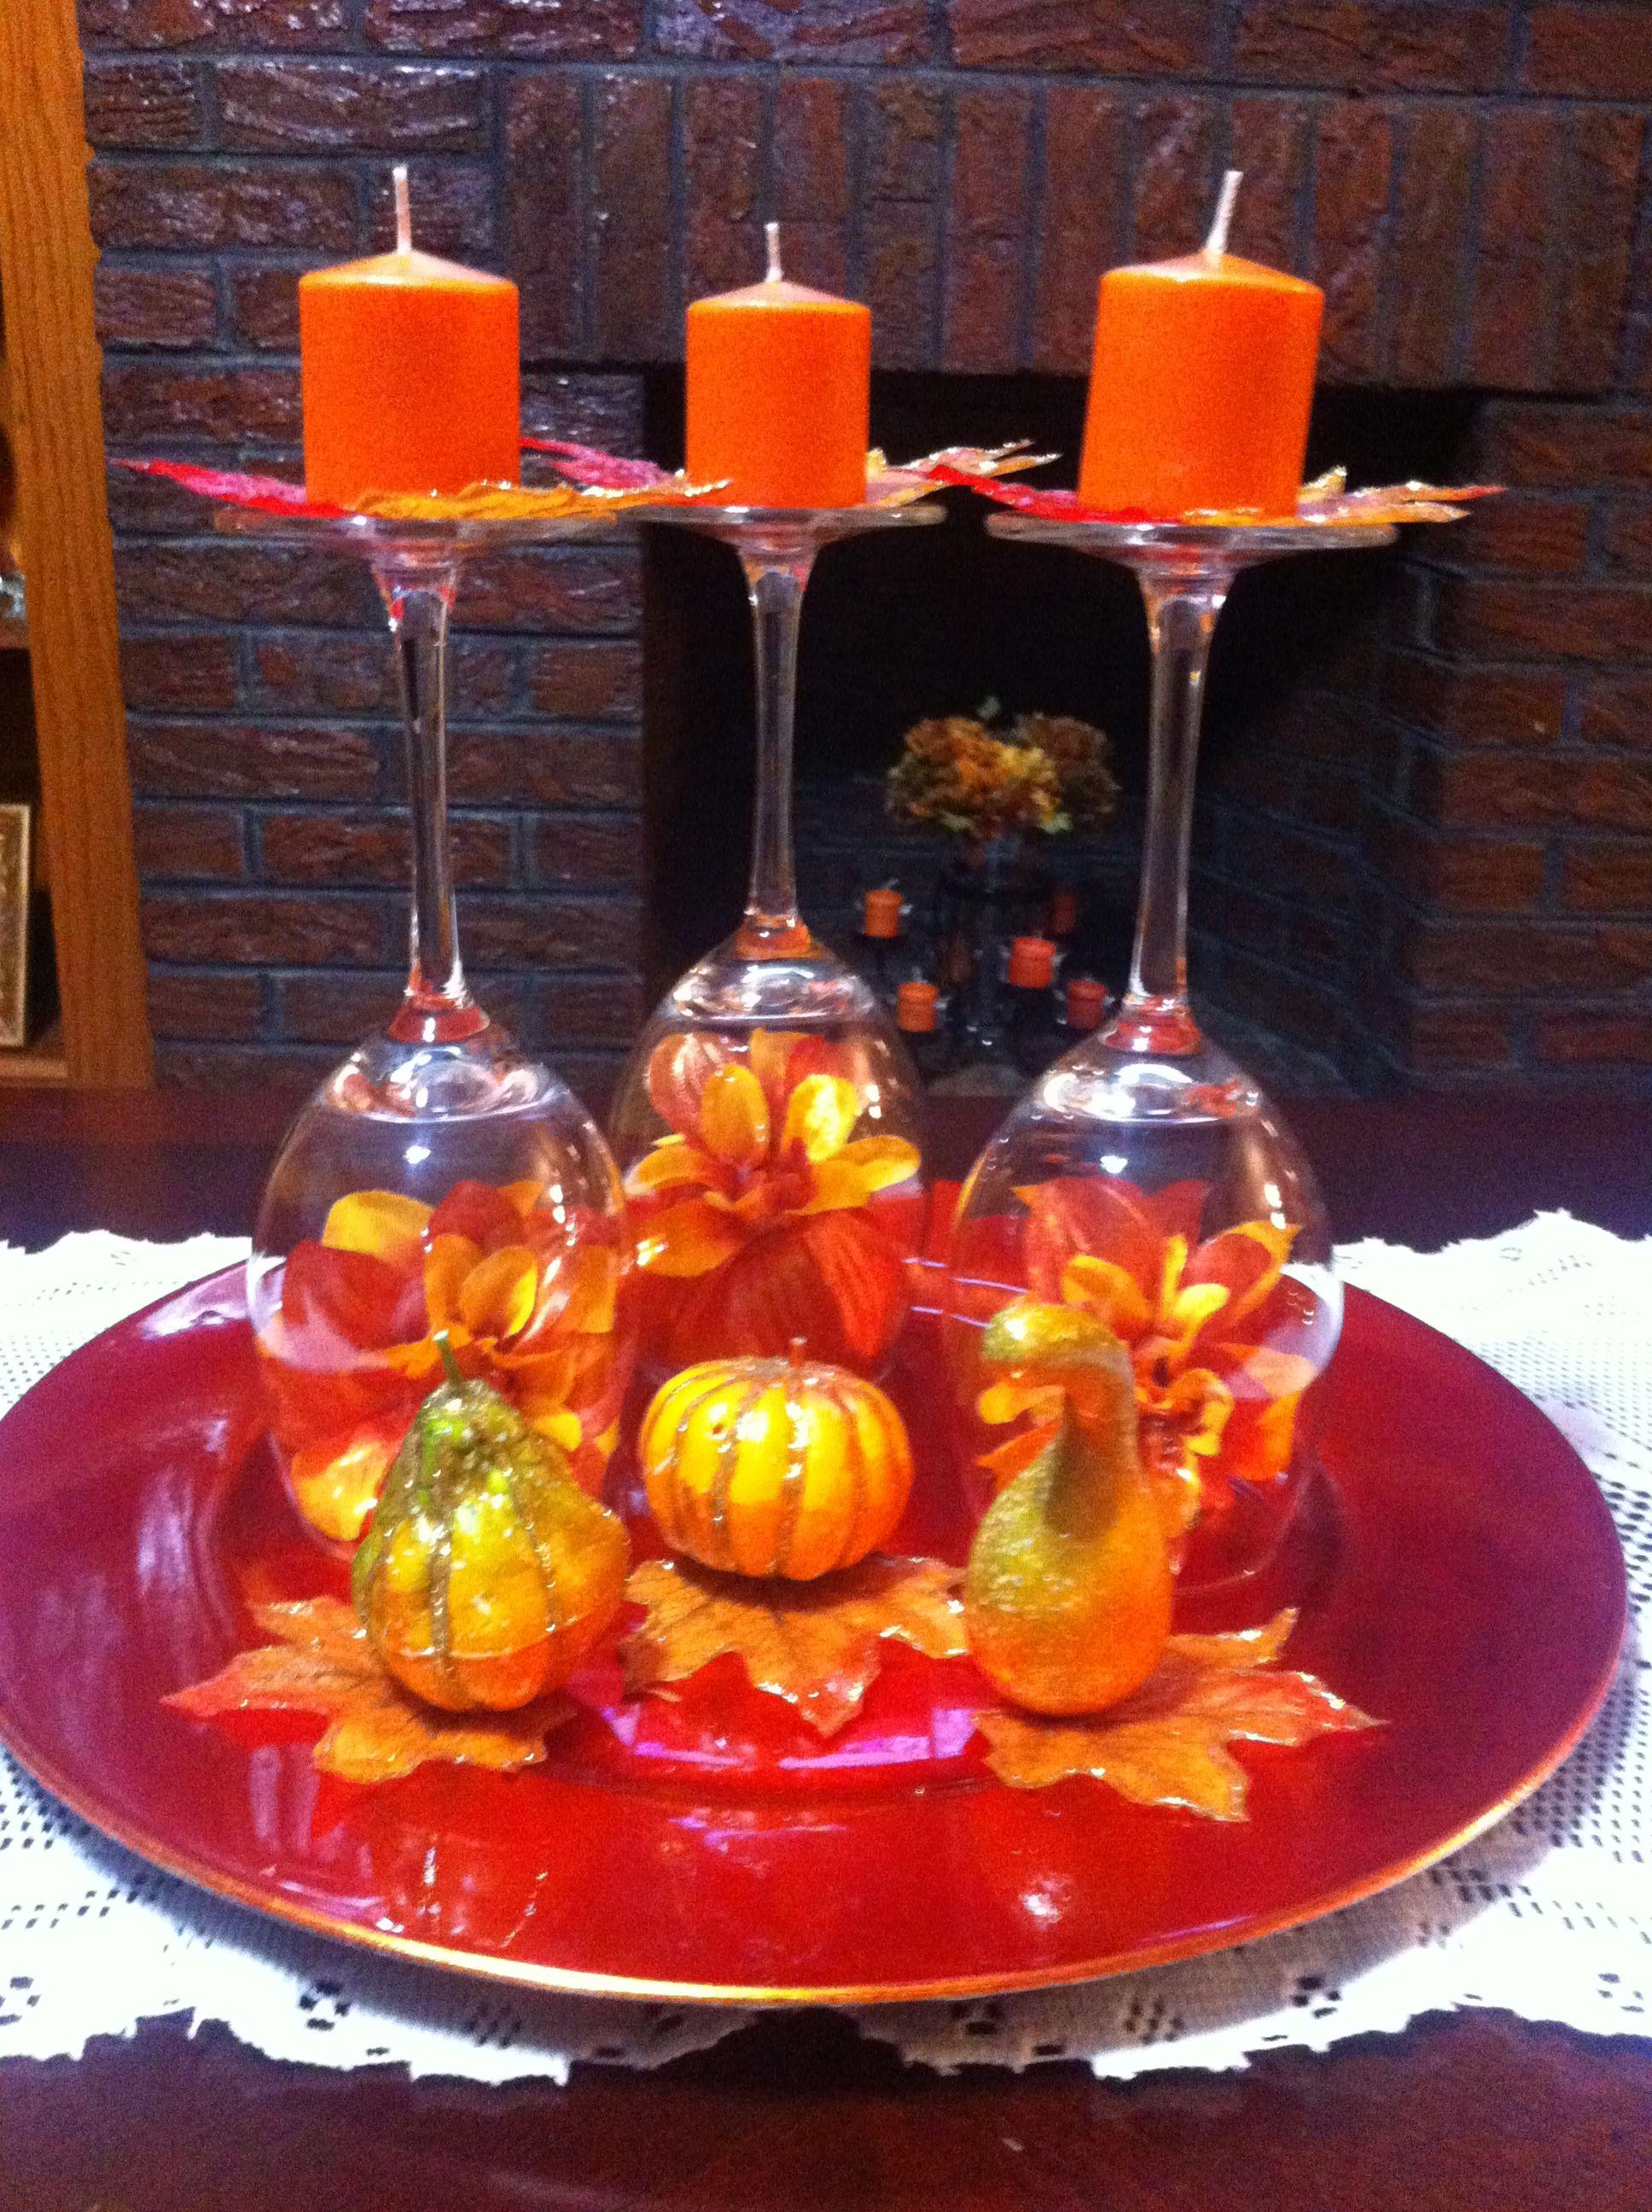 Pin By Graciela Lendechy On Mis Creaciones Wine Glass Centerpieces Creative Thanksgiving Decor Fall Thanksgiving Decor